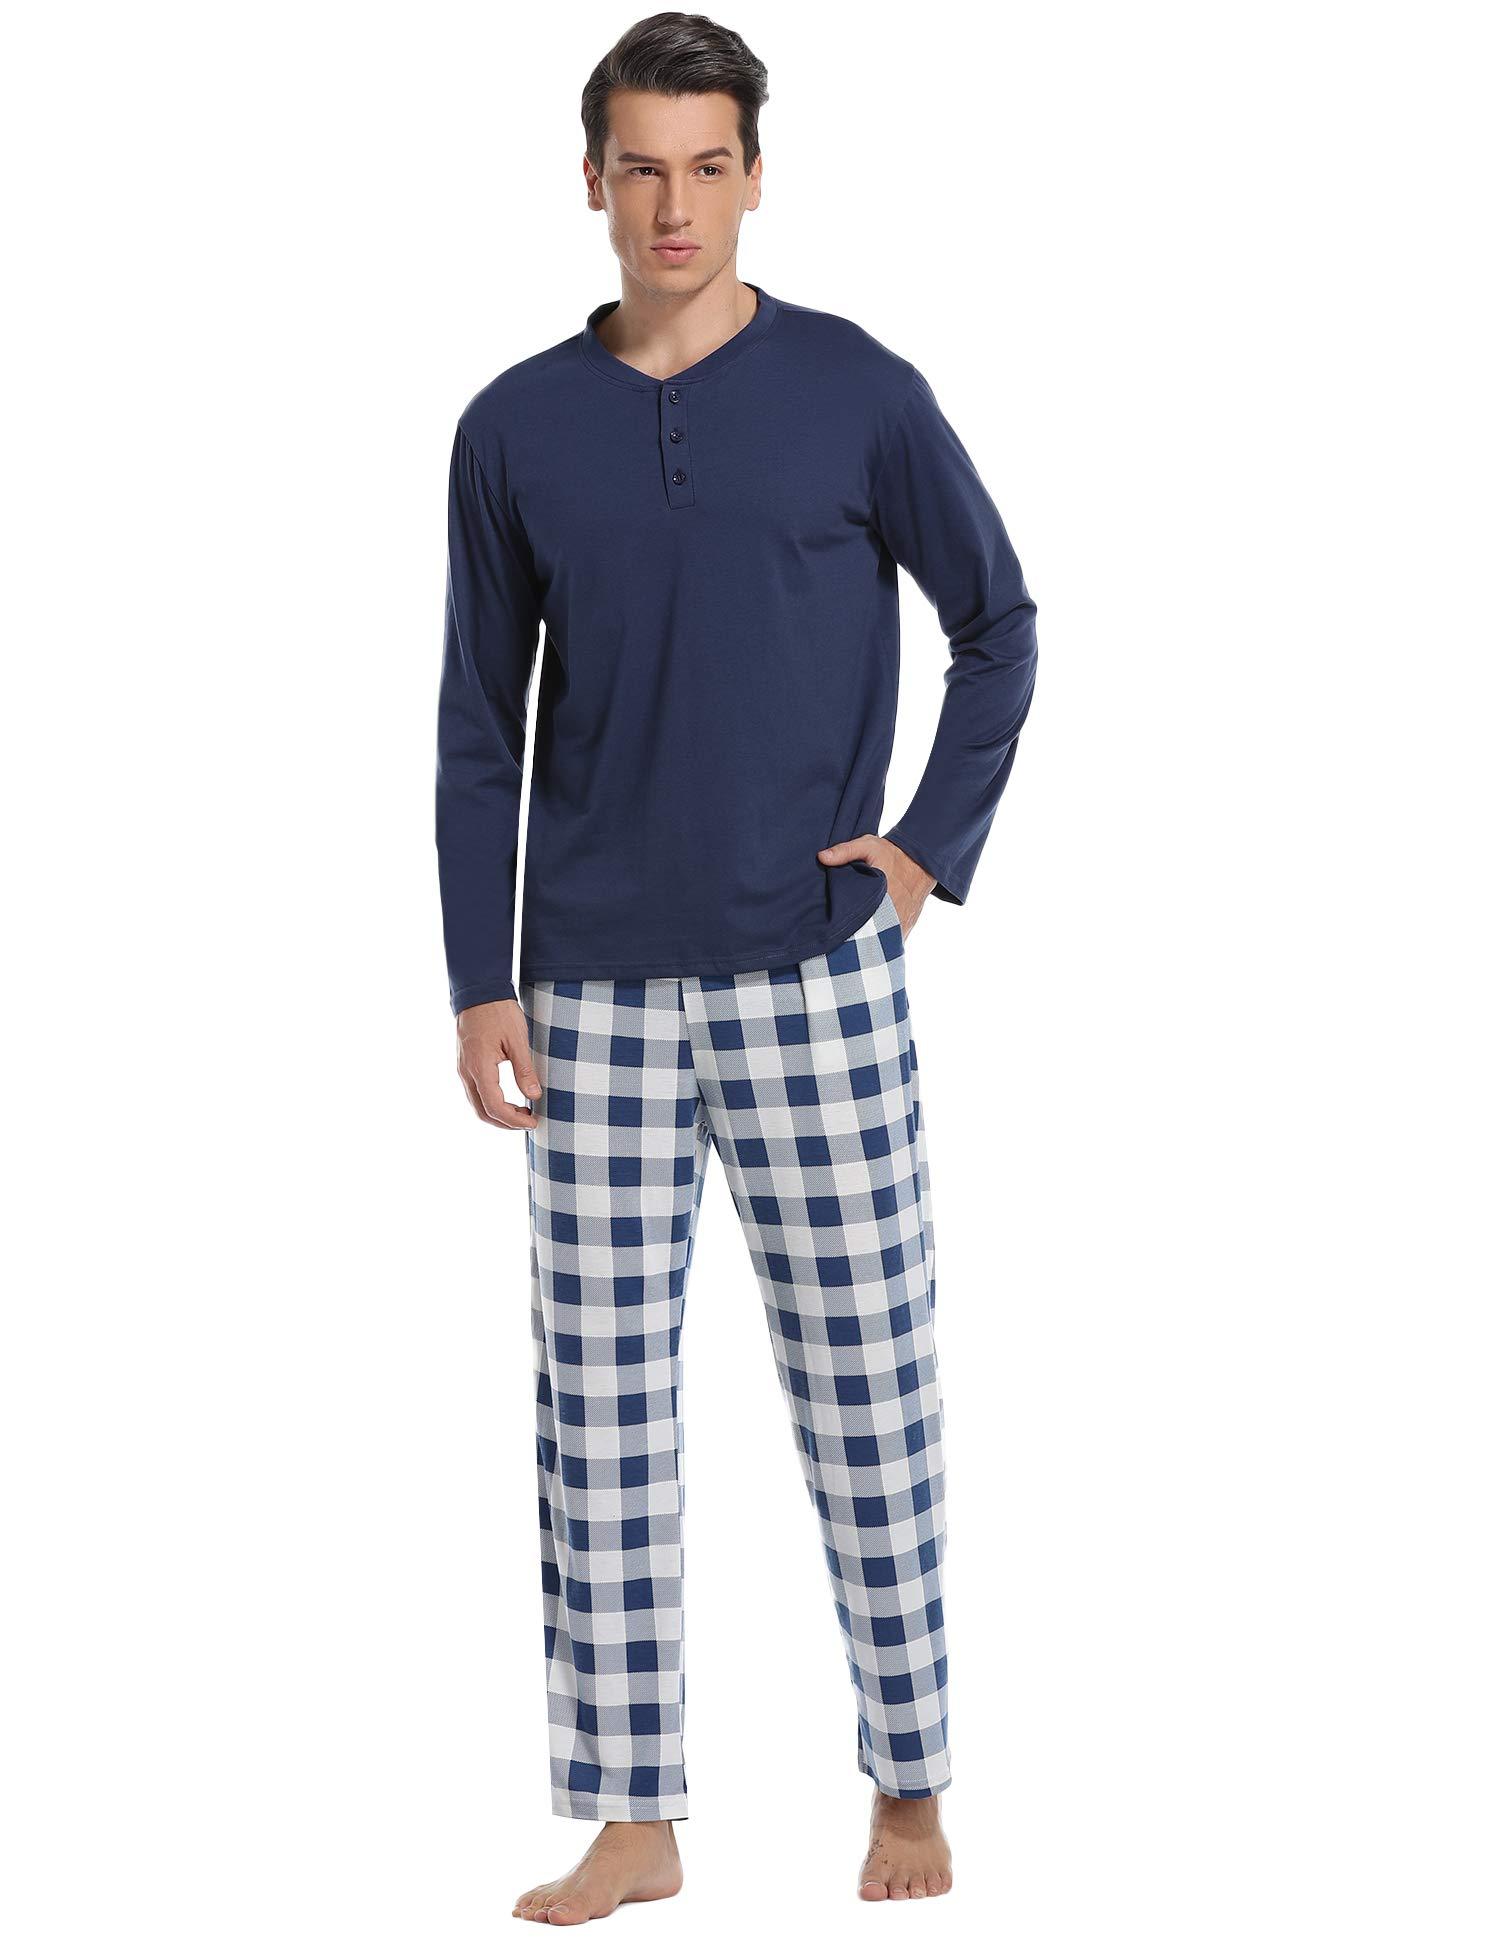 Vlazom Men's Pajama Sets Long Sleeve Top and Plaid Fleece Pants for Men Sleepwear PJs